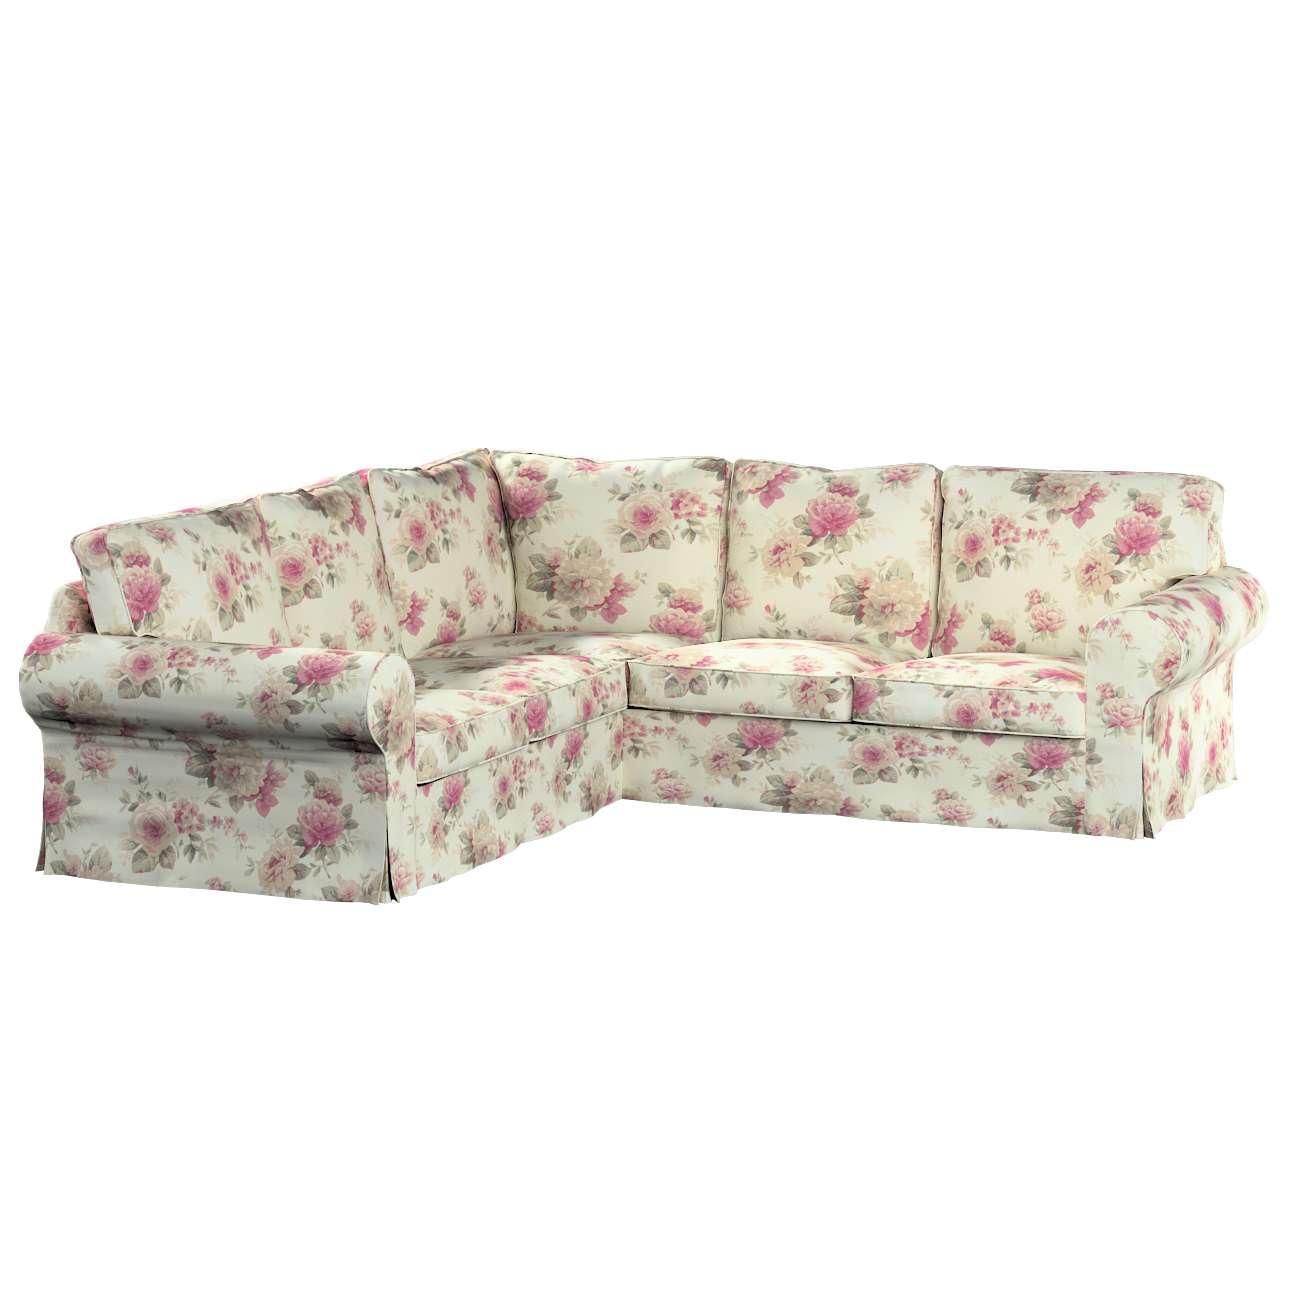 Ektorp kampinė sofa Ektorp kampinė sofa kolekcijoje Mirella, audinys: 141-07